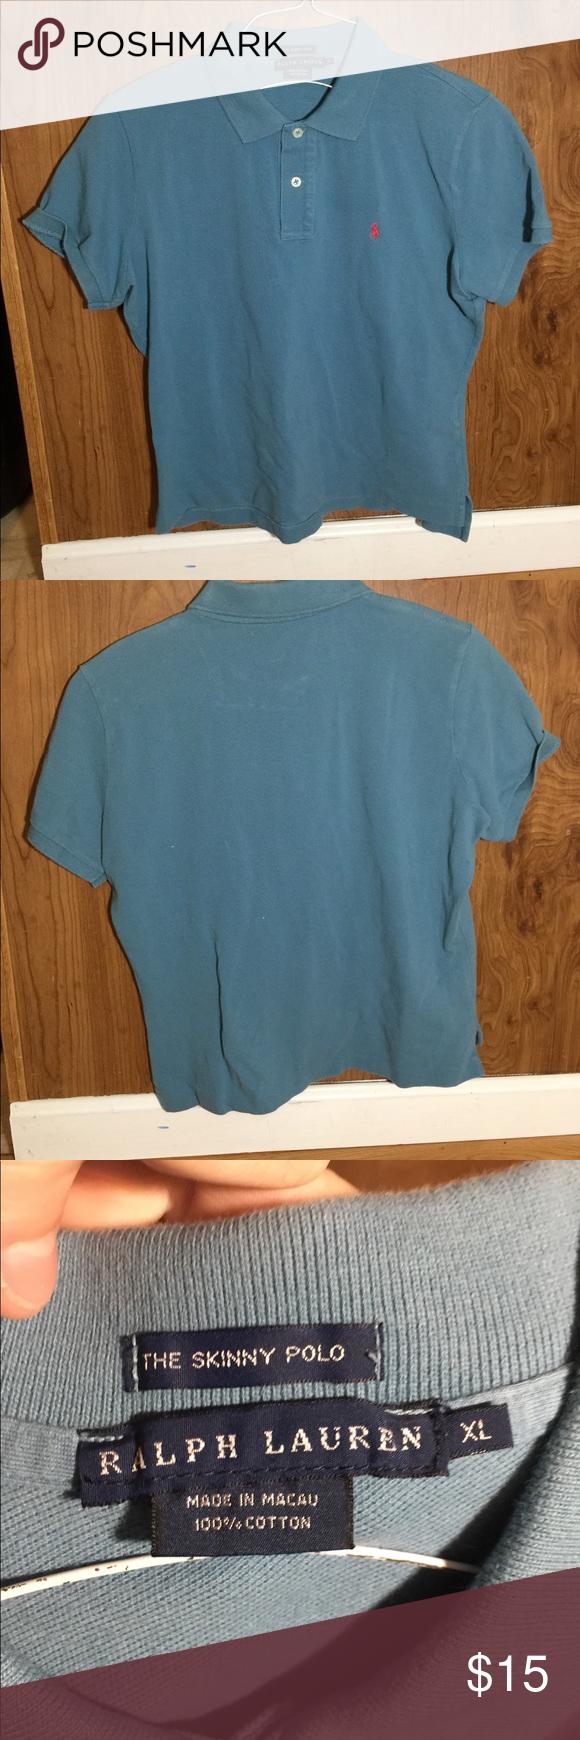 Women\'s S/S Polo Ralph Lauren Polo Shirt